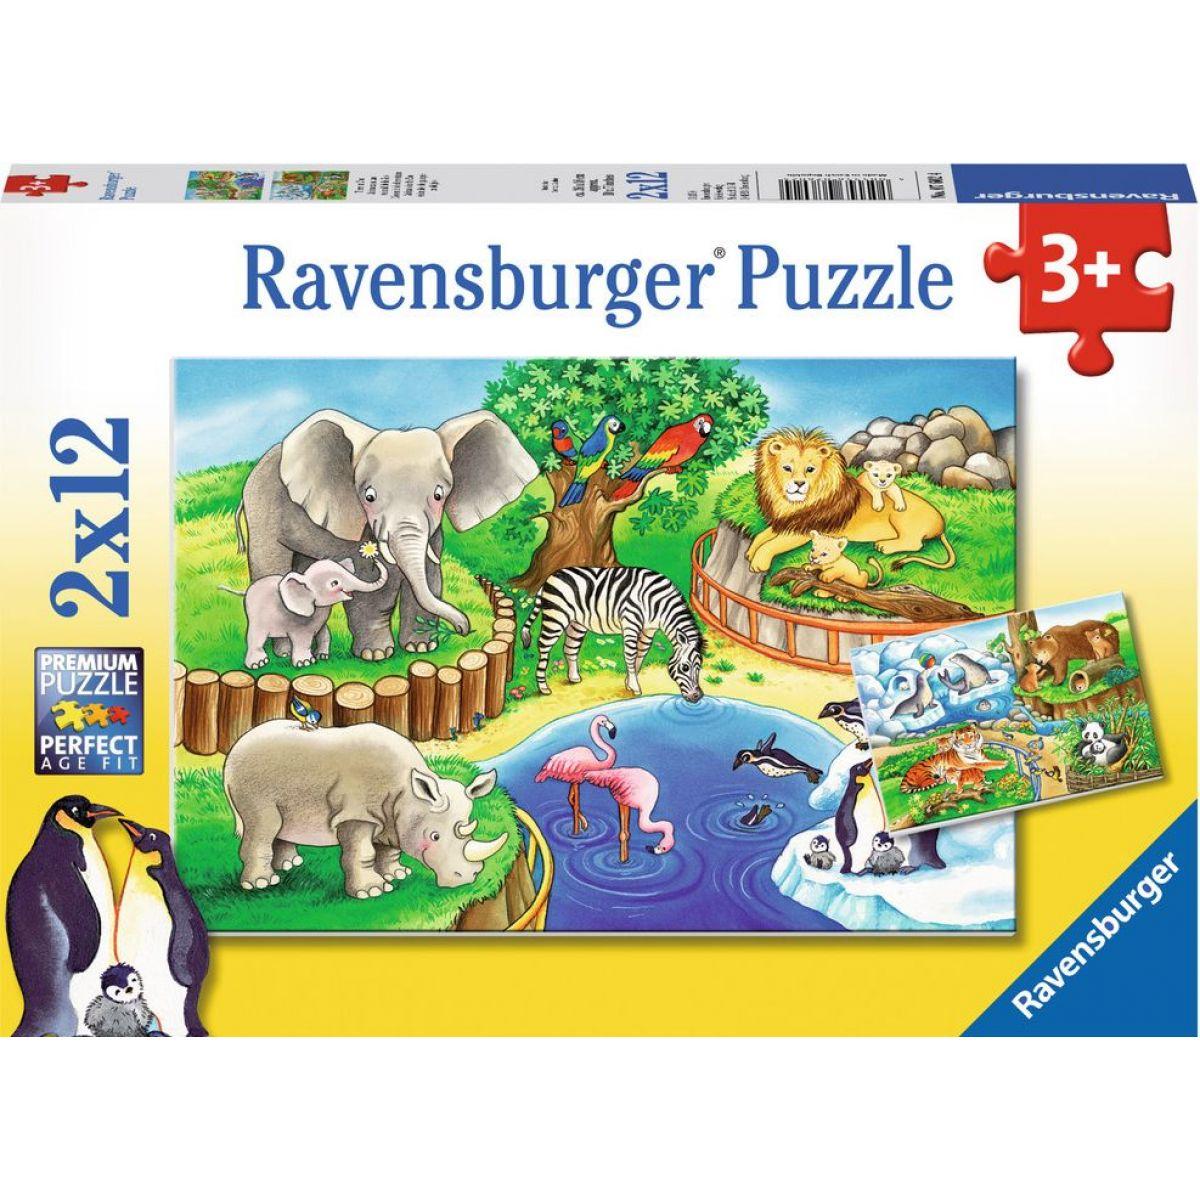 Ravensburger Puzzle Zvieratá v ZOO 2 x 12 dielikov